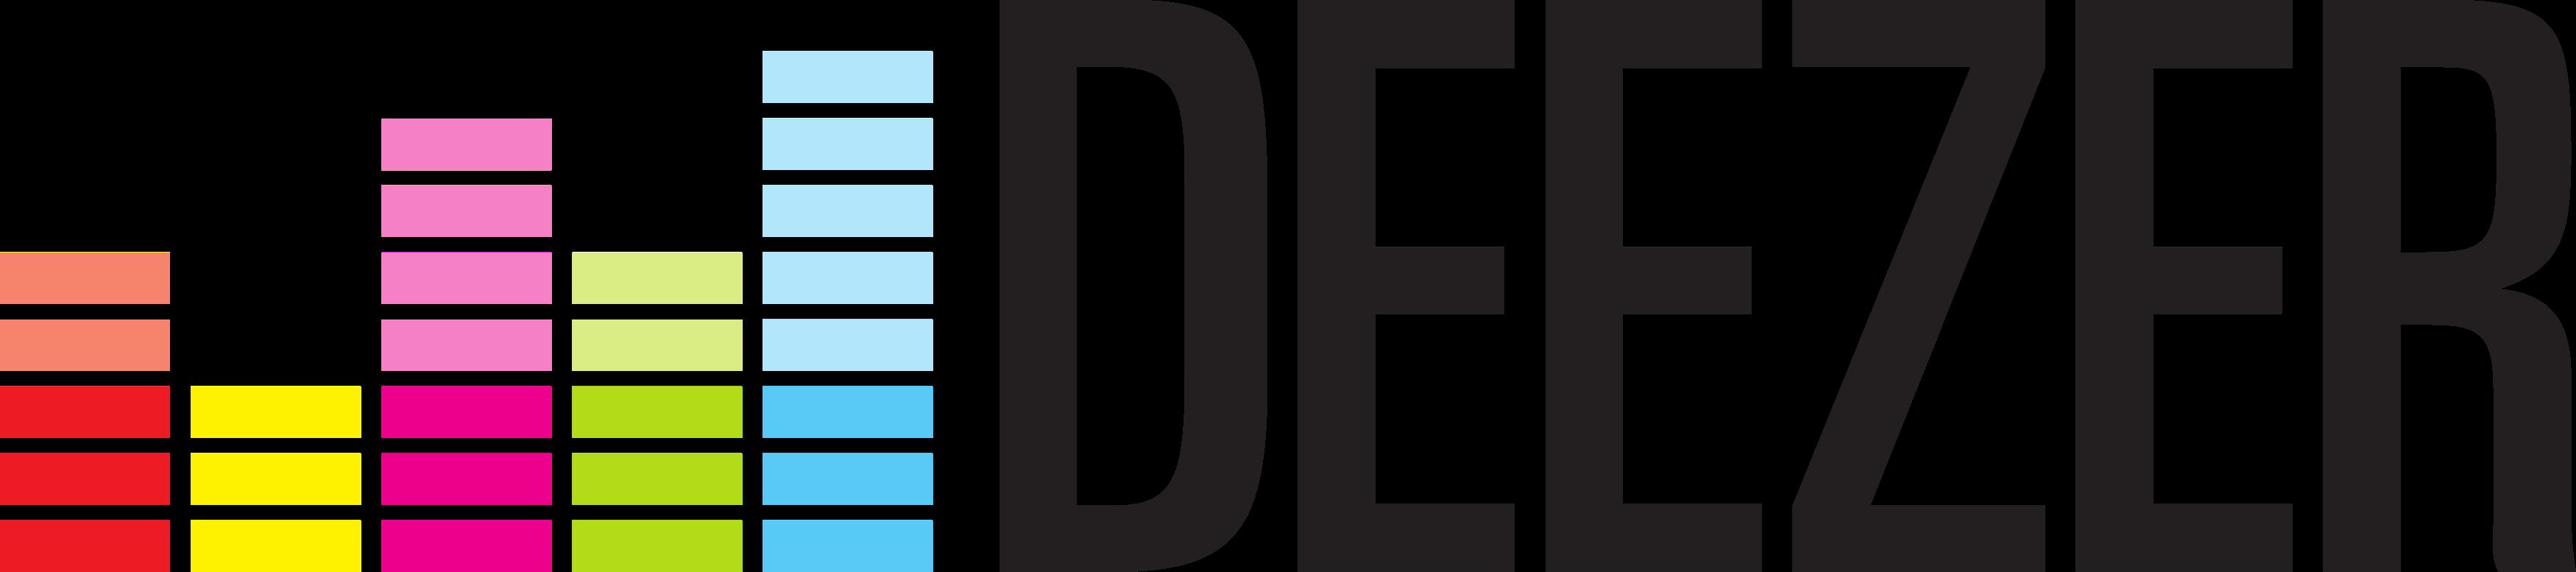 deezer logo - Deezer Logo